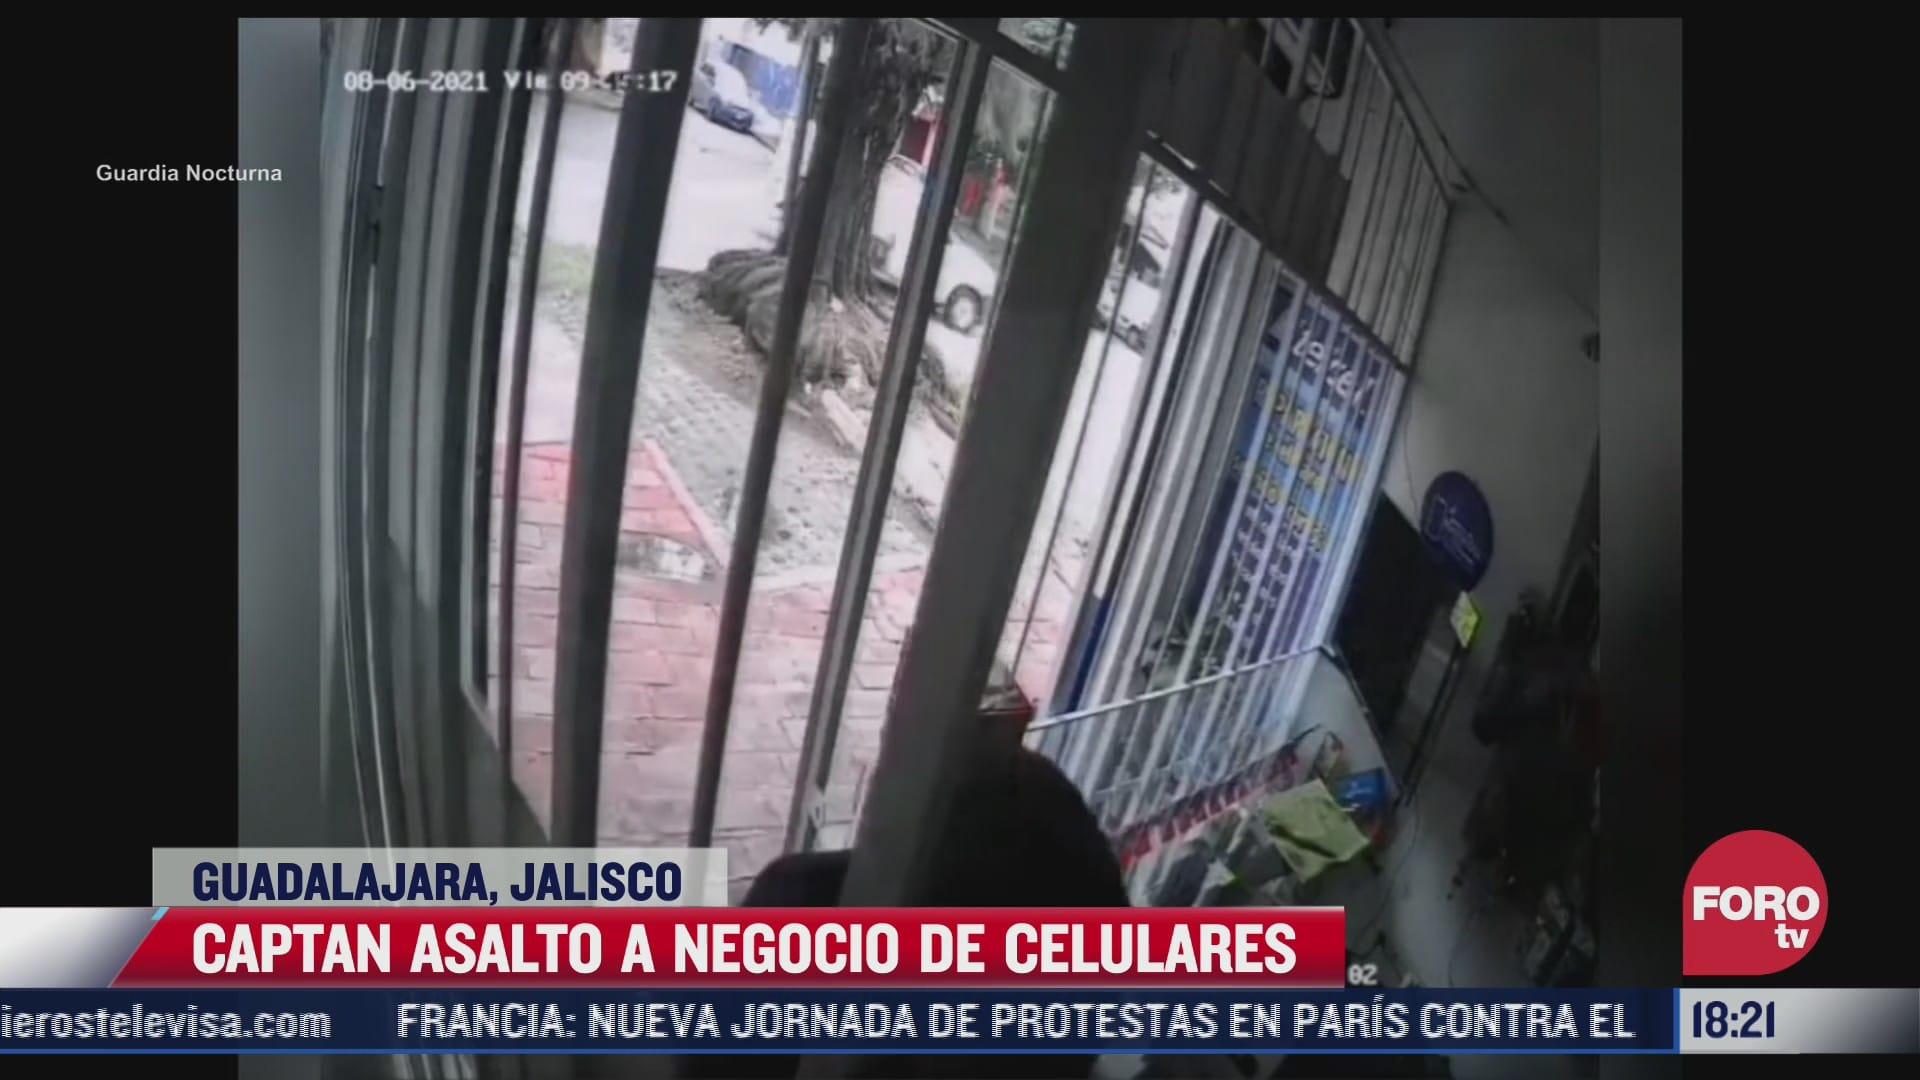 captan asalto a negocio de celulares en guadalajara